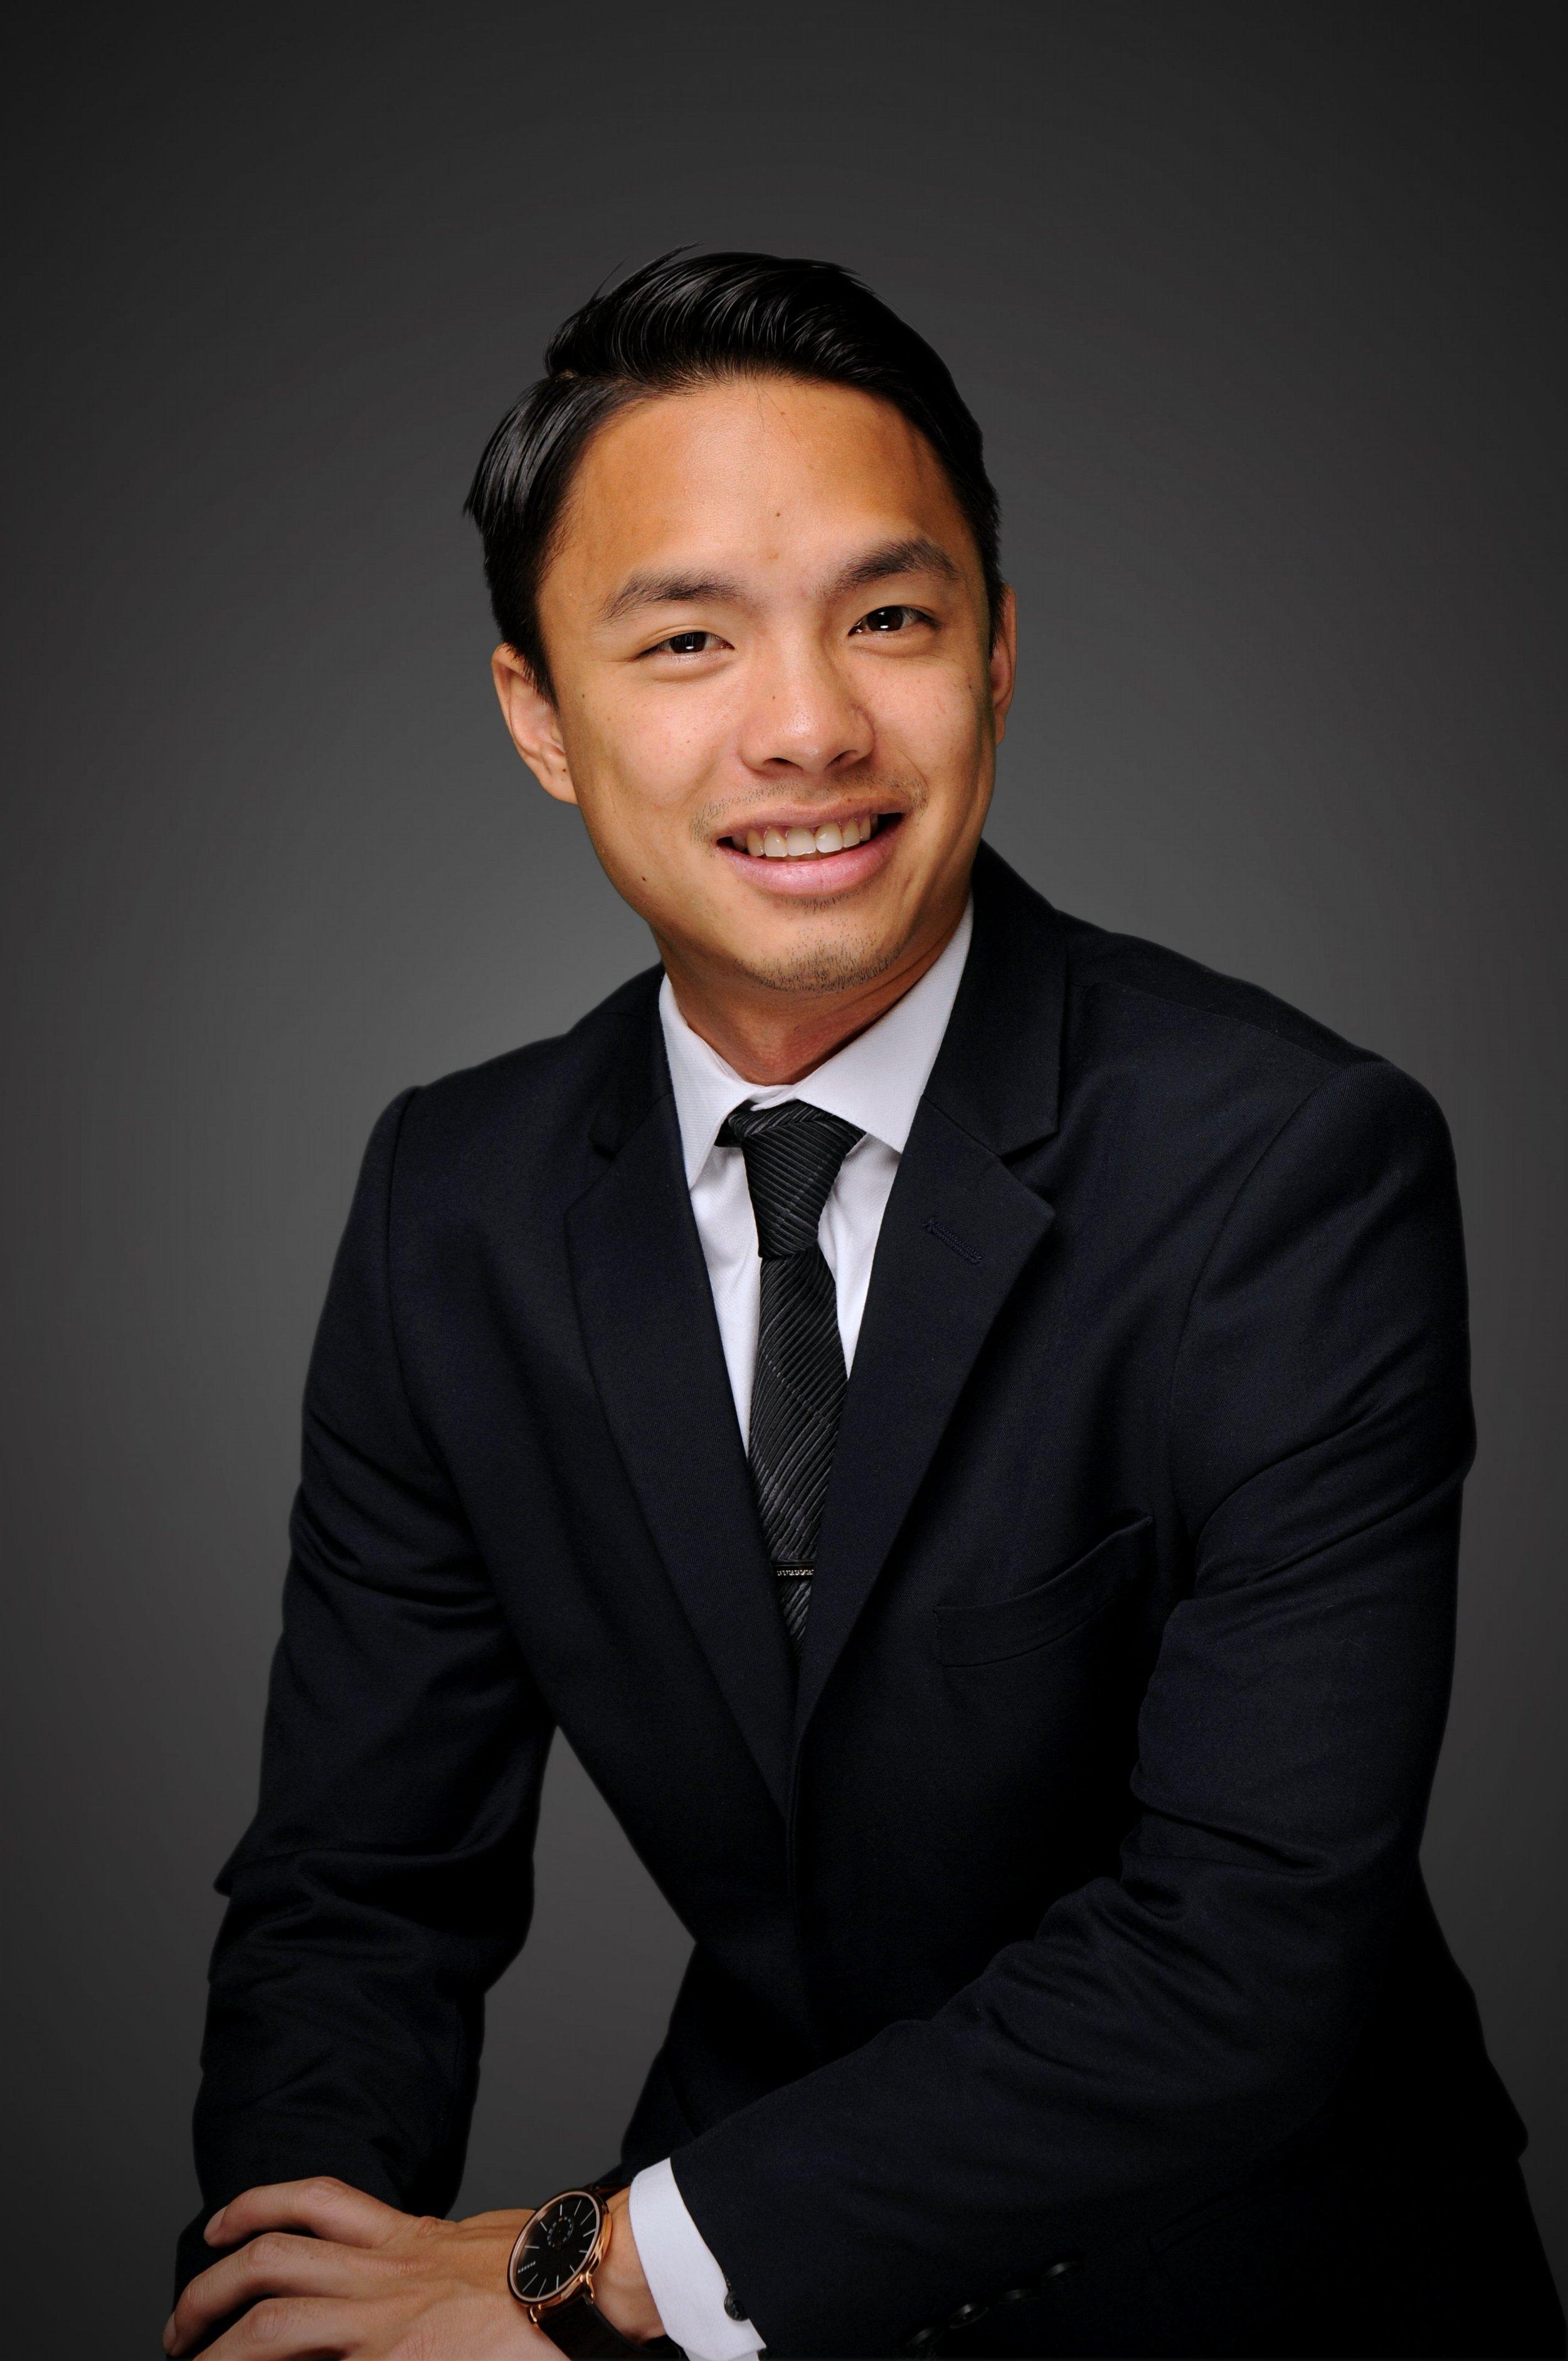 Jonathan Koo , NYU Stern School of Business MBA '18